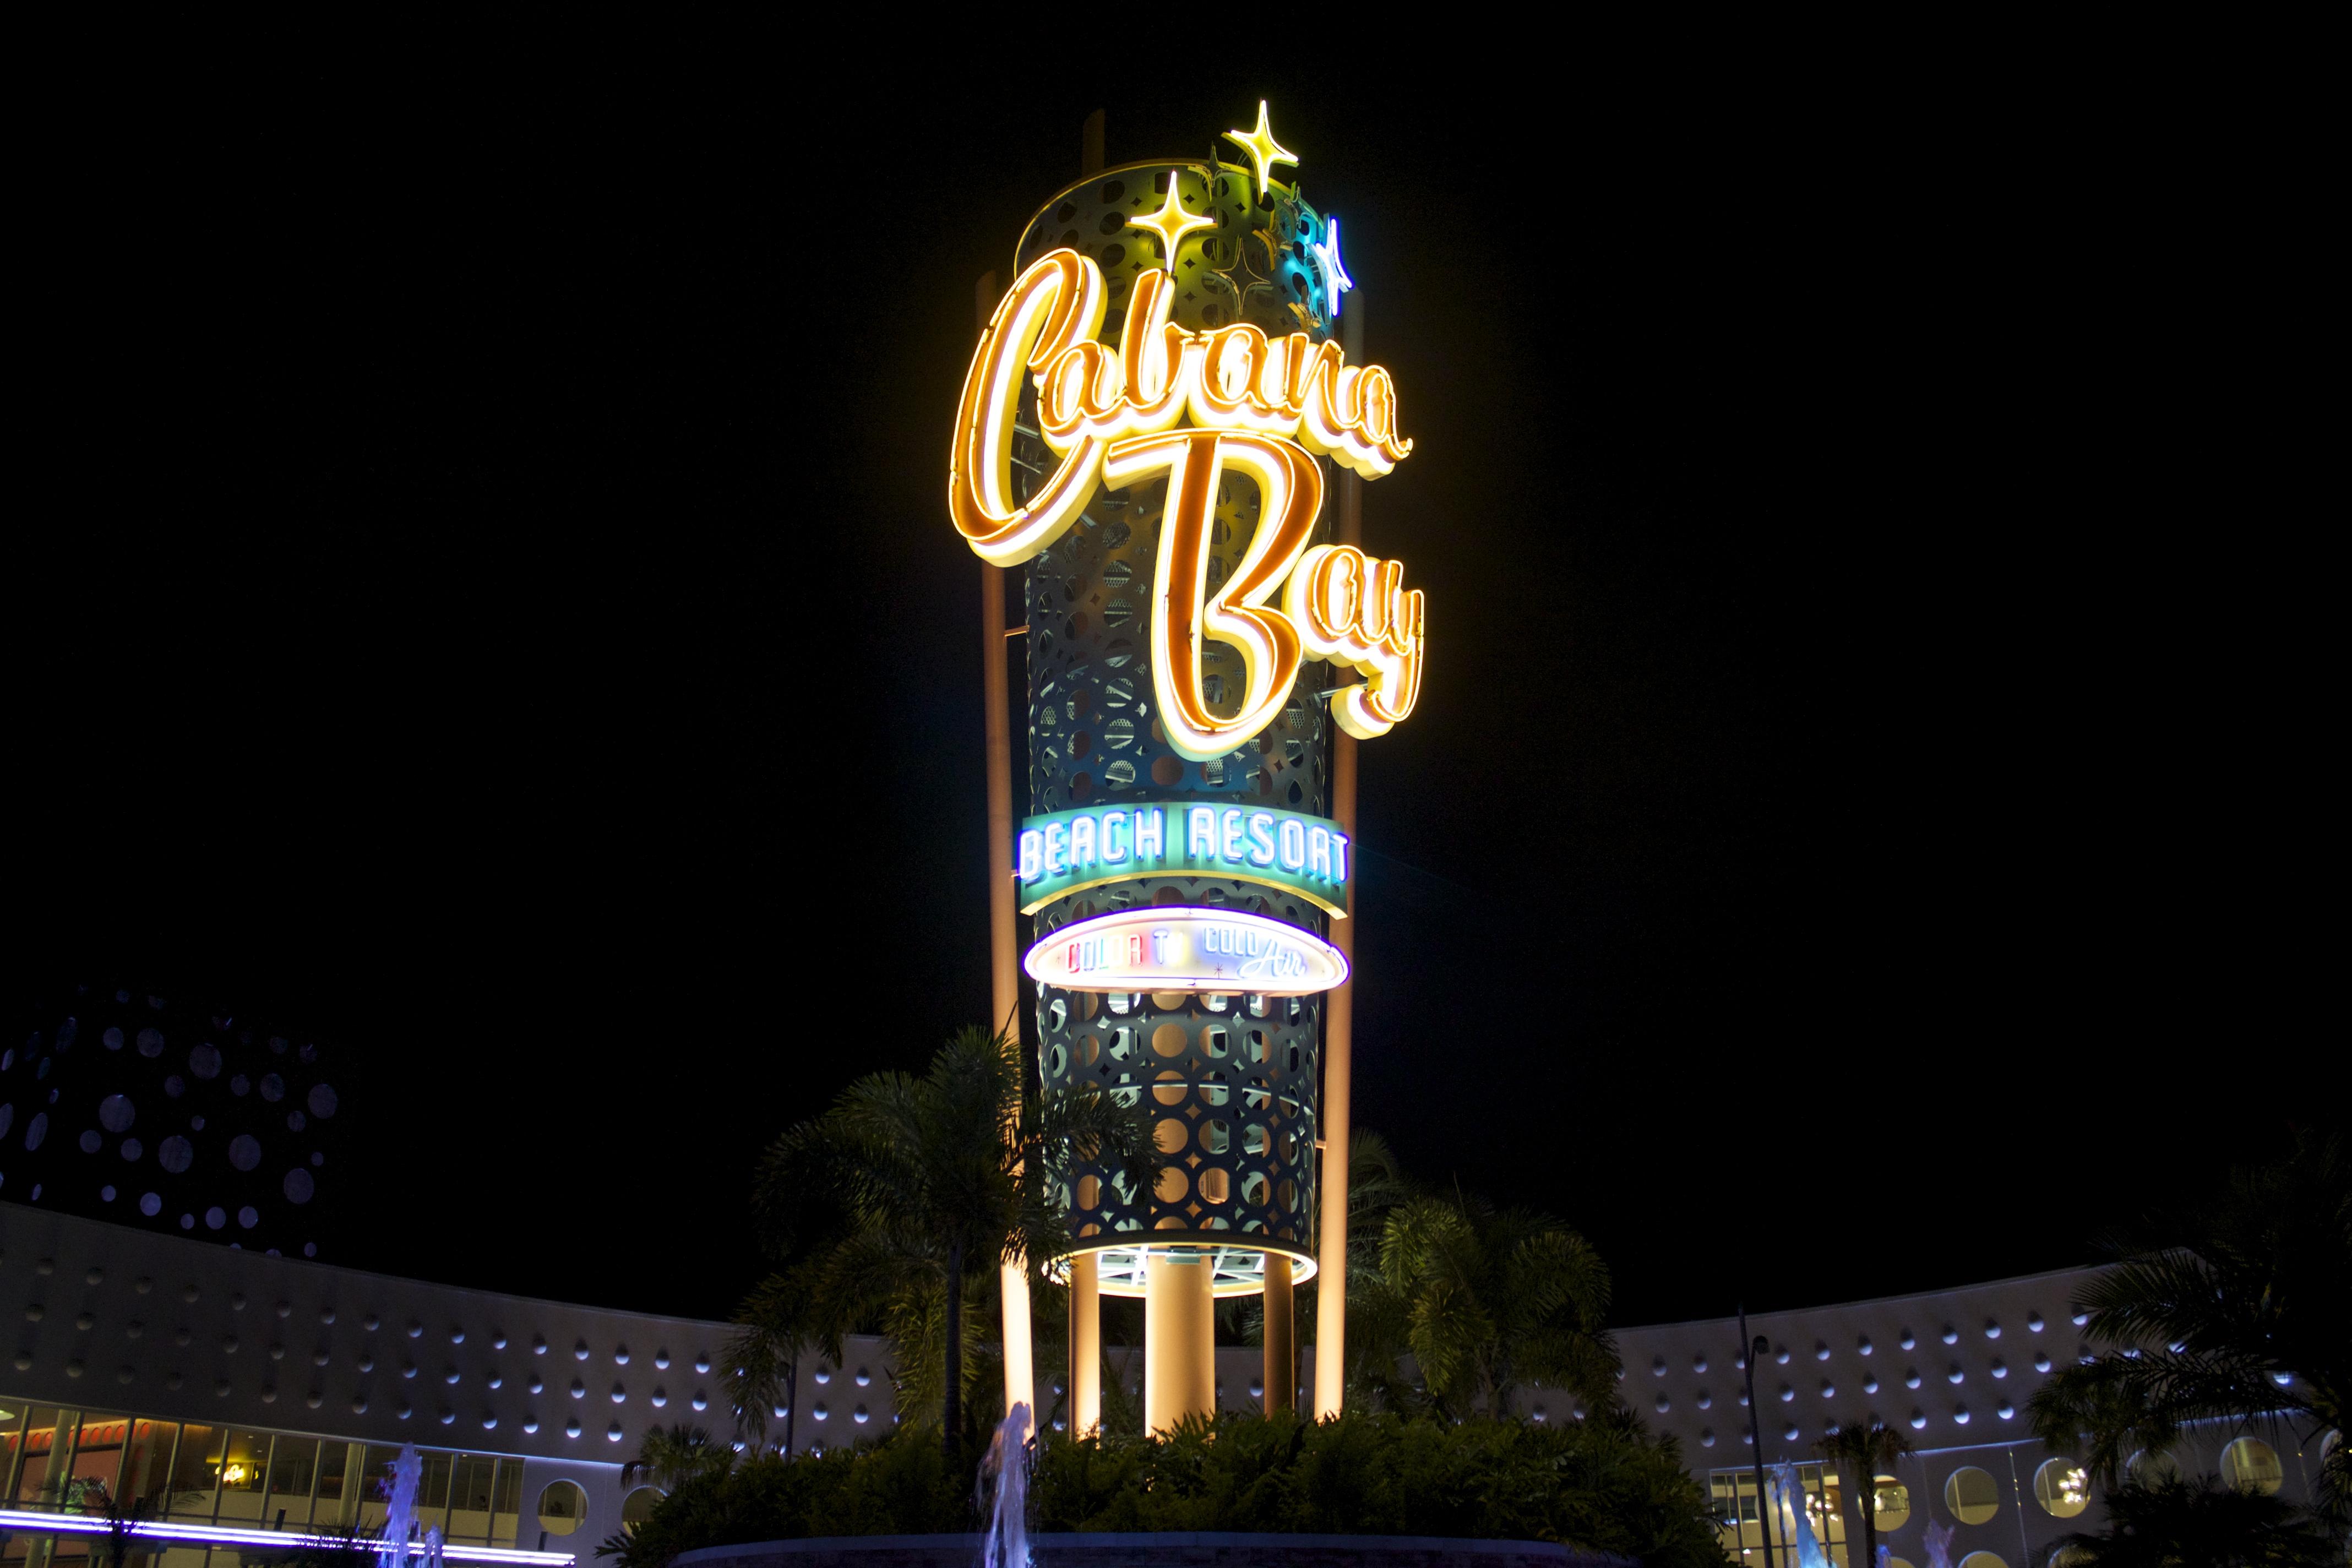 cabana bay beach-entrance